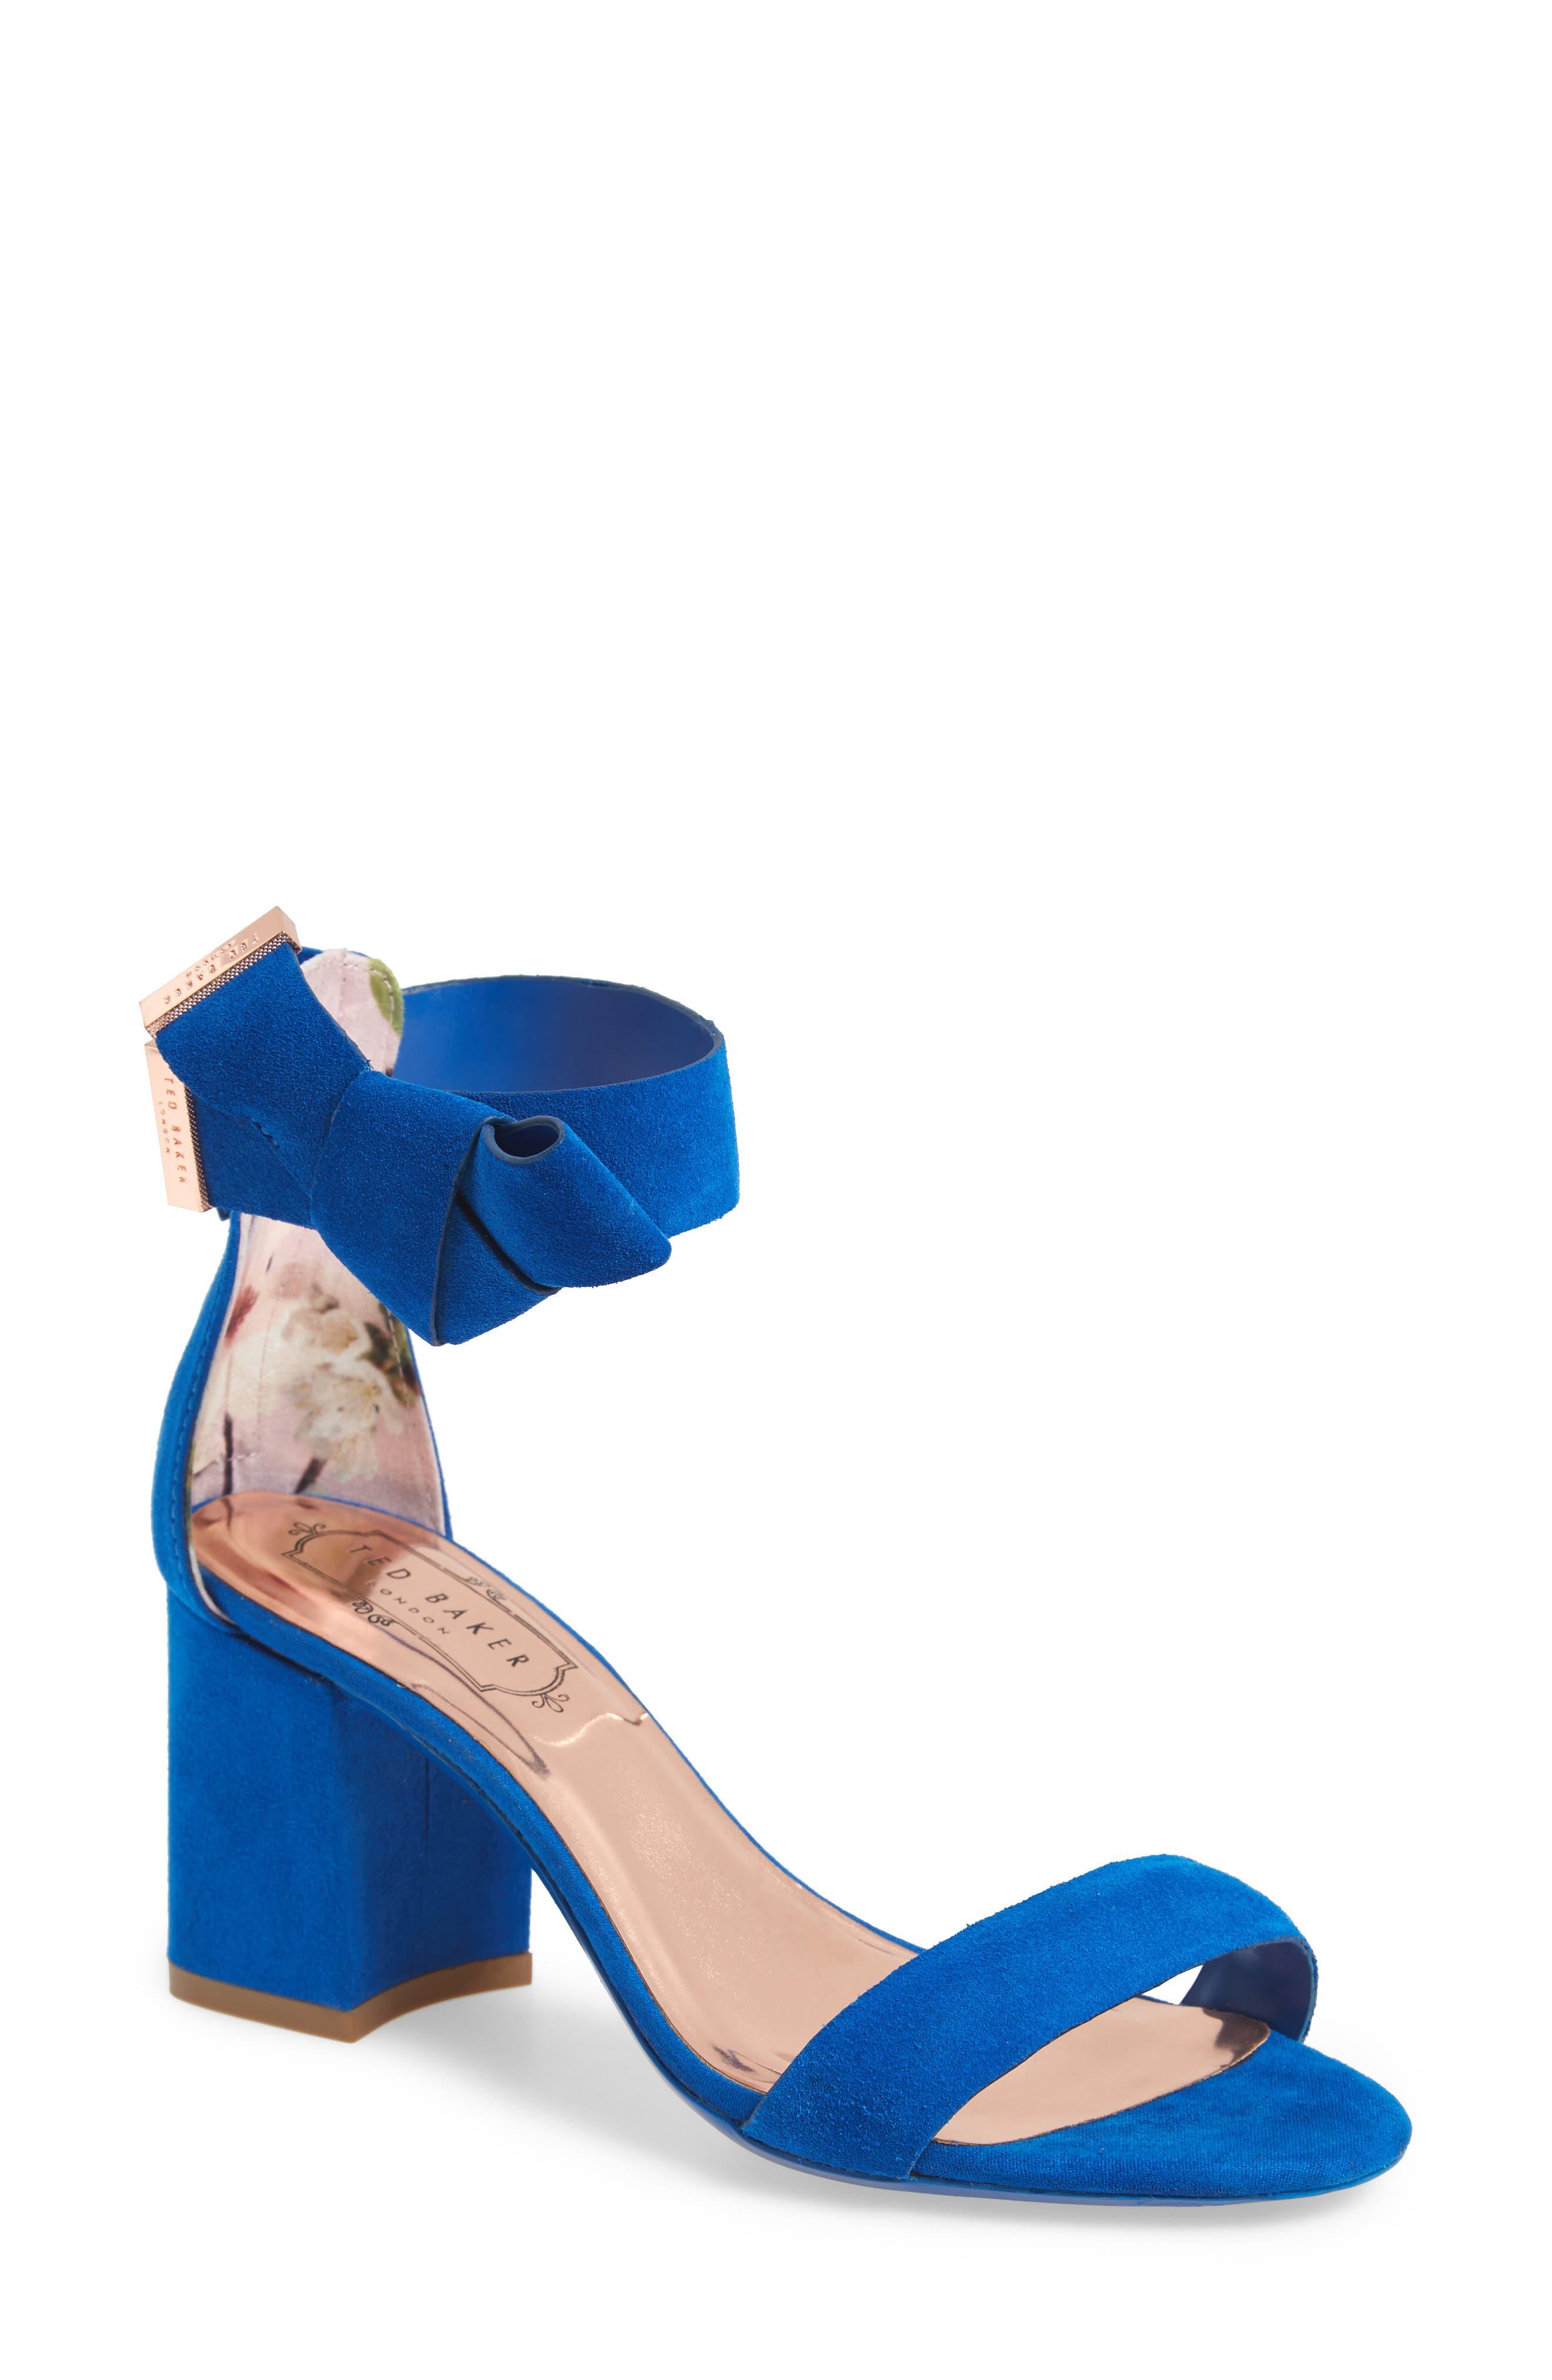 Kerrias Block Heel Sandal,                         Main,                         color, Blue Suede